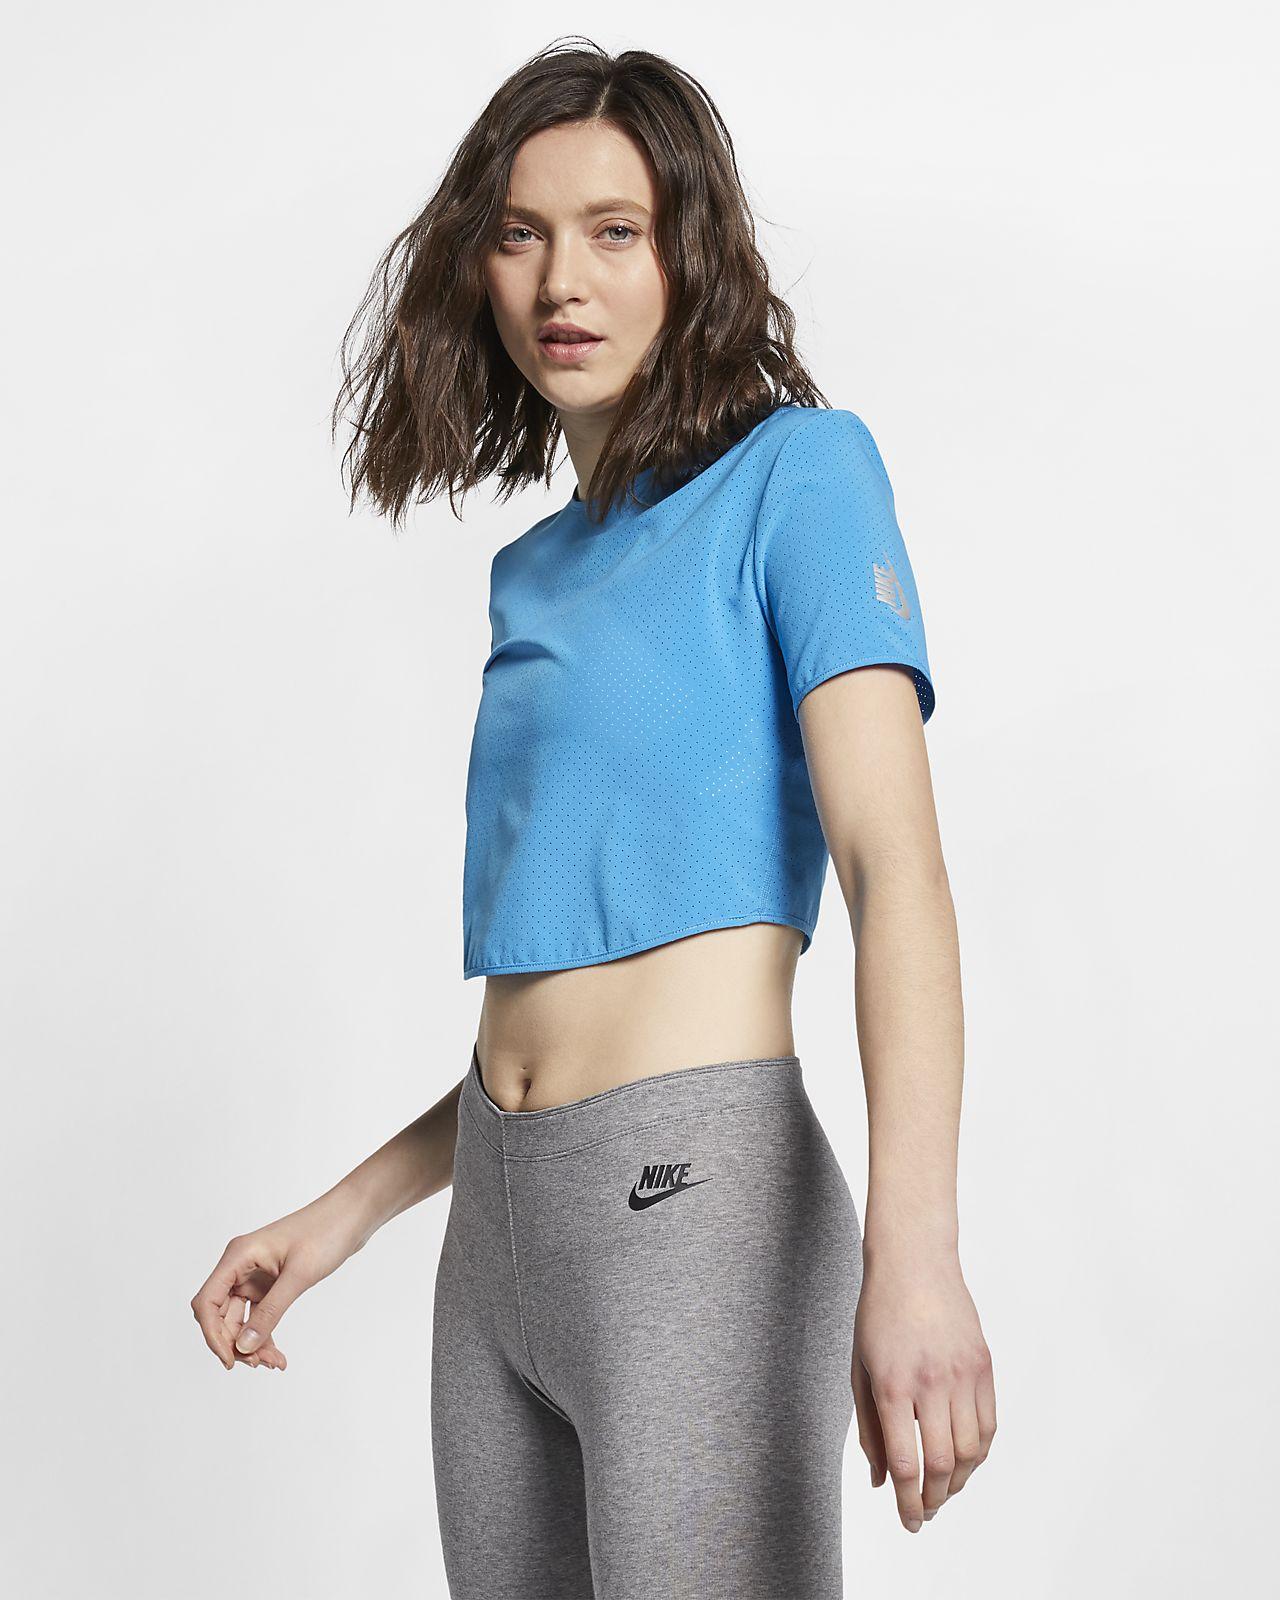 Nike City Ready Women's Top